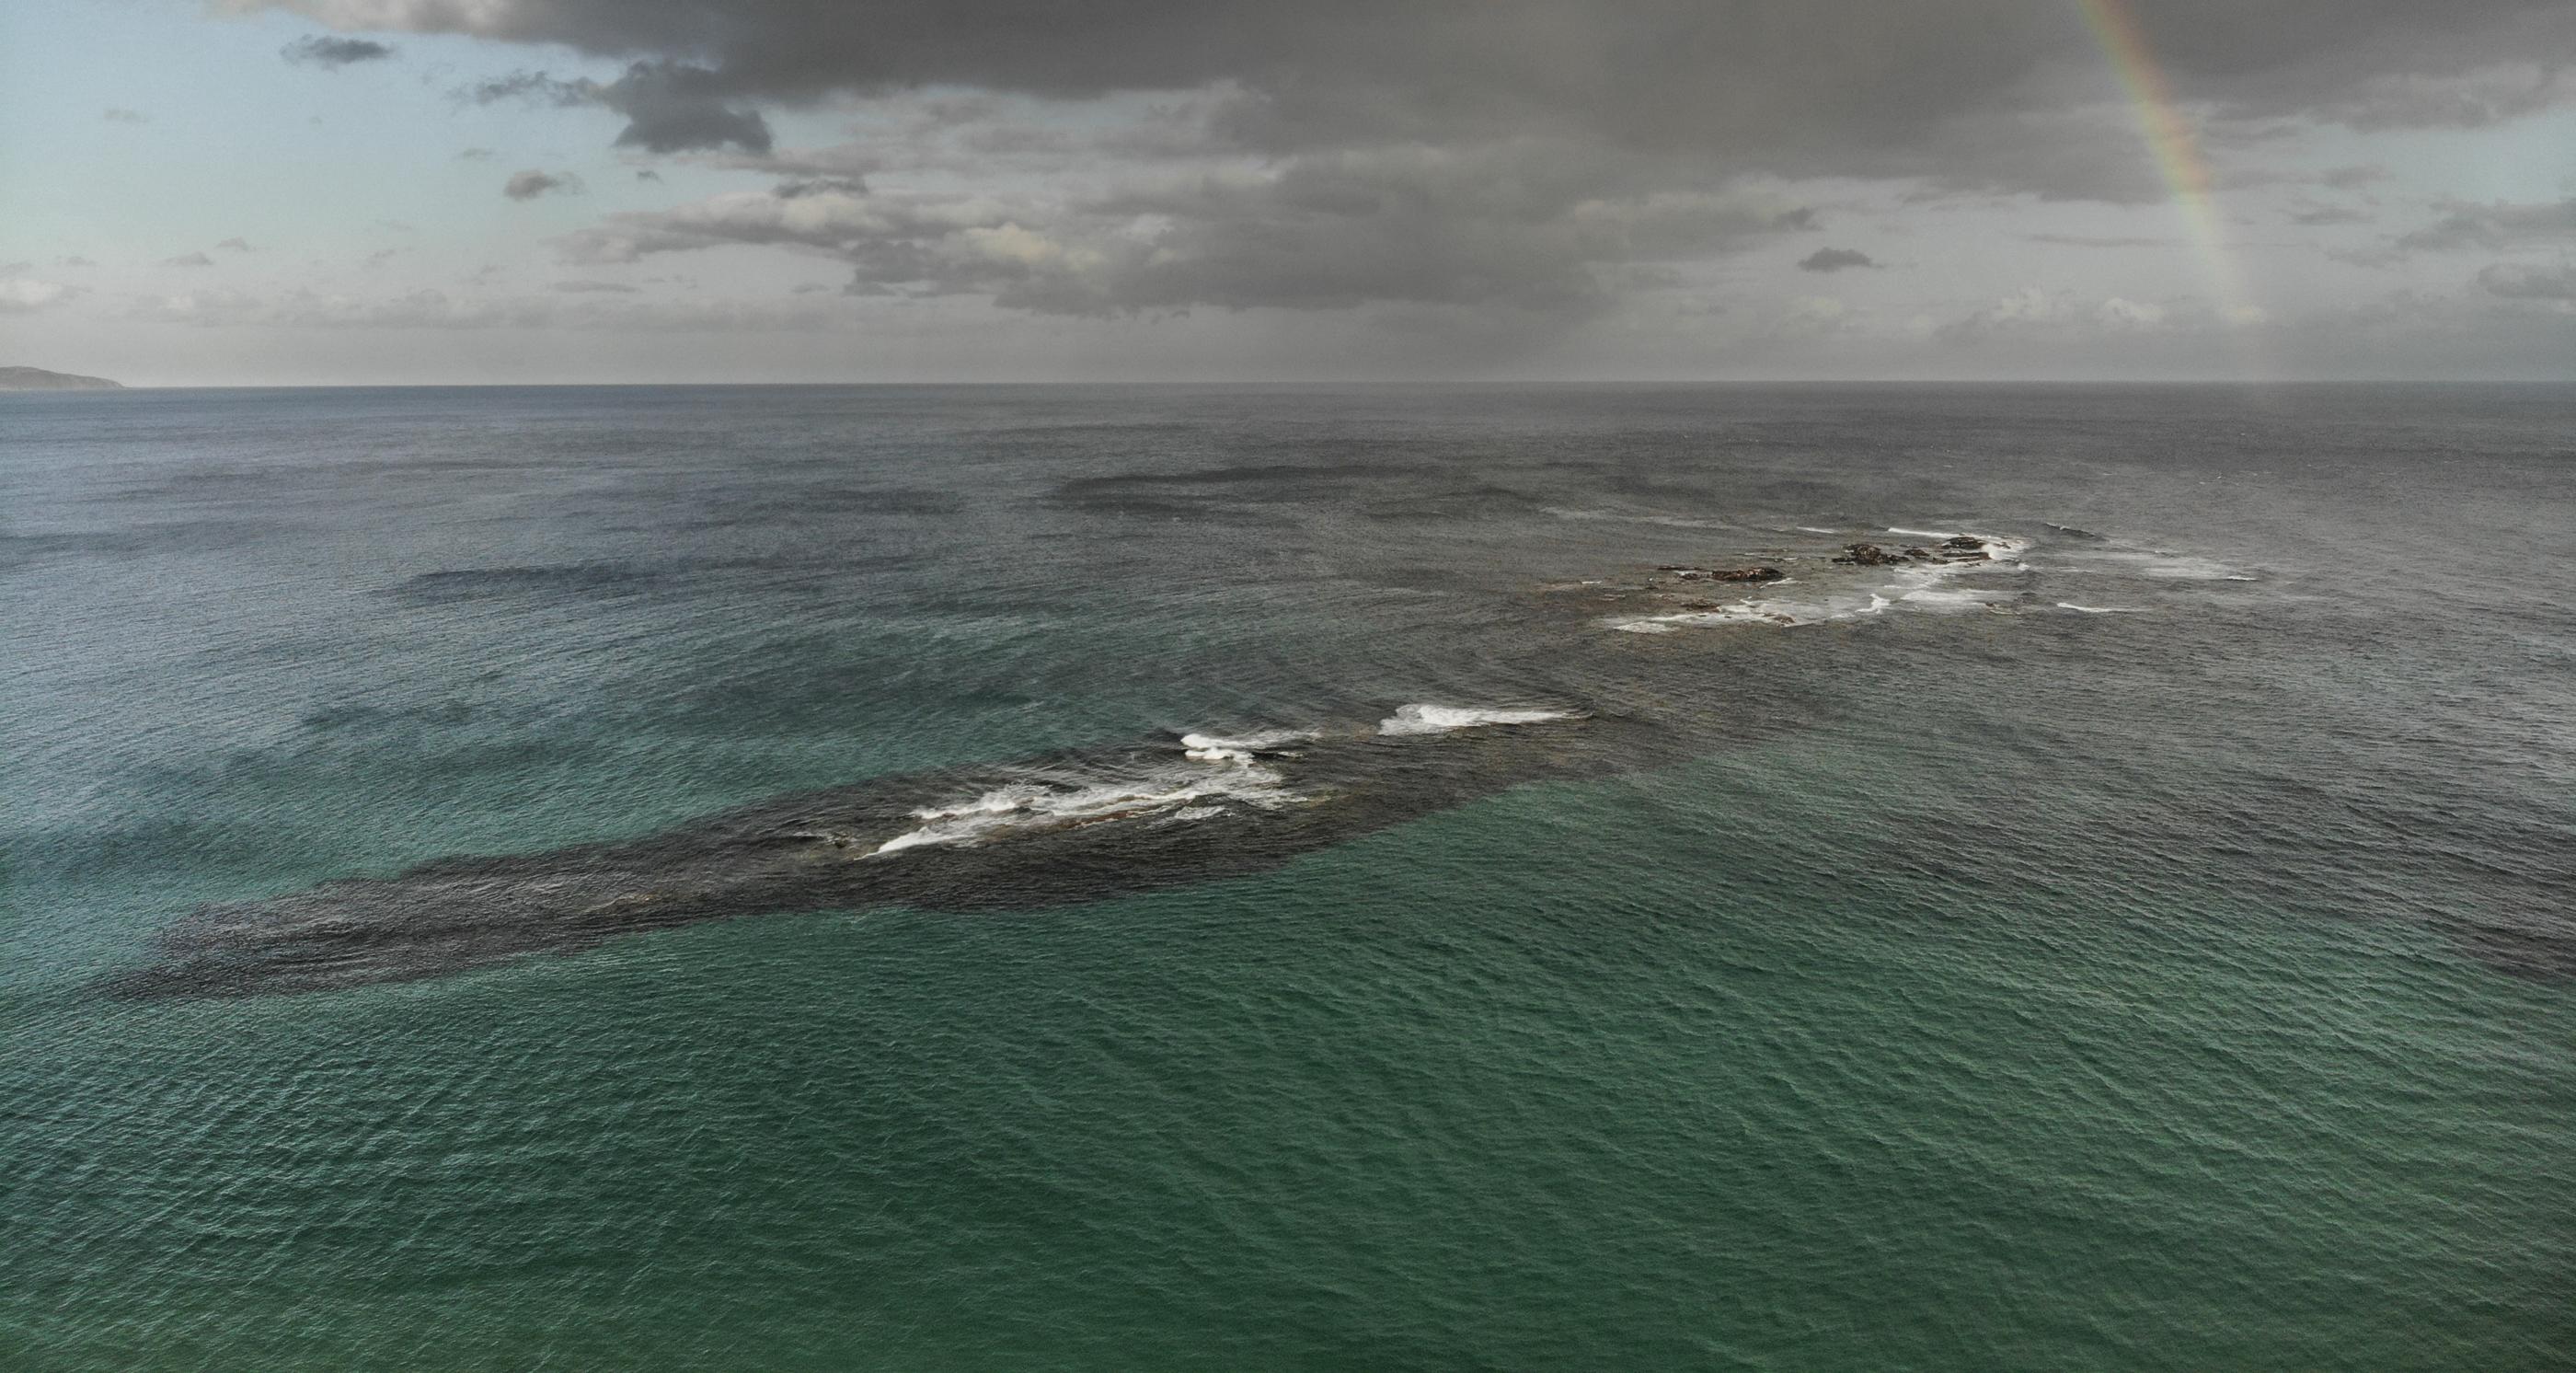 Little Henty Reef from drone